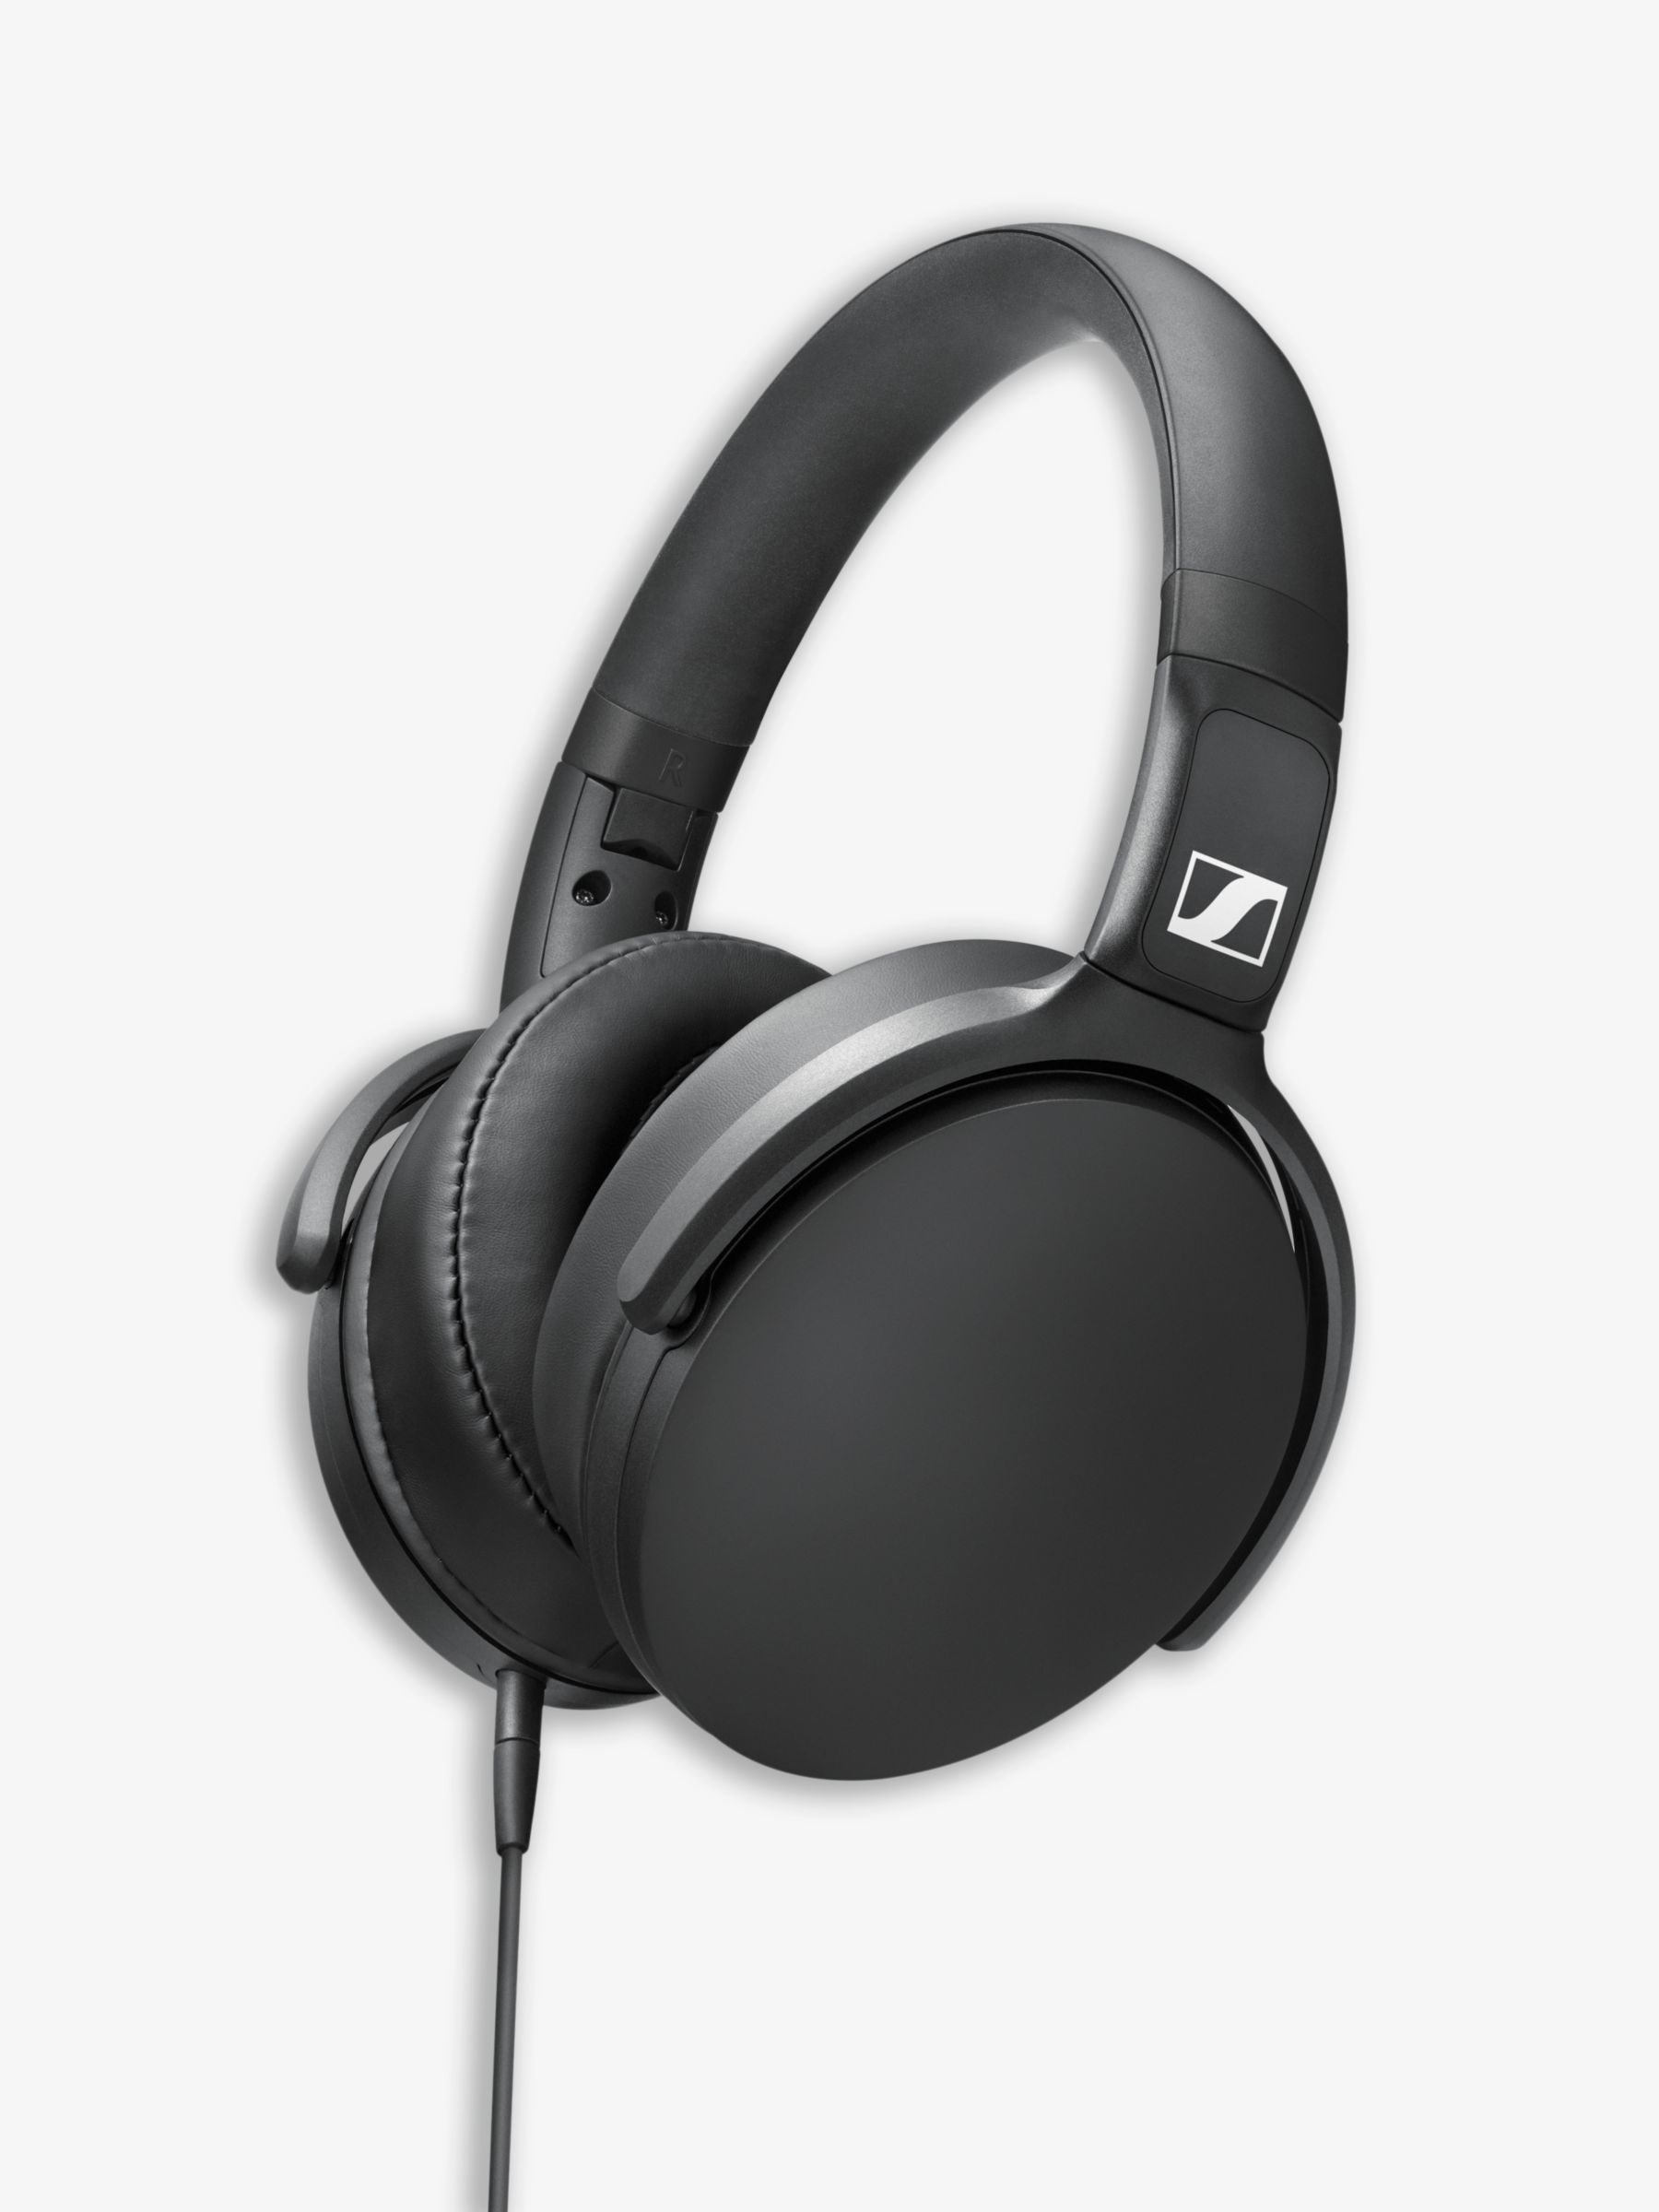 Sennheiser Sennheiser HD 400S Over-Ear Headphones with Mic/Remote, Black